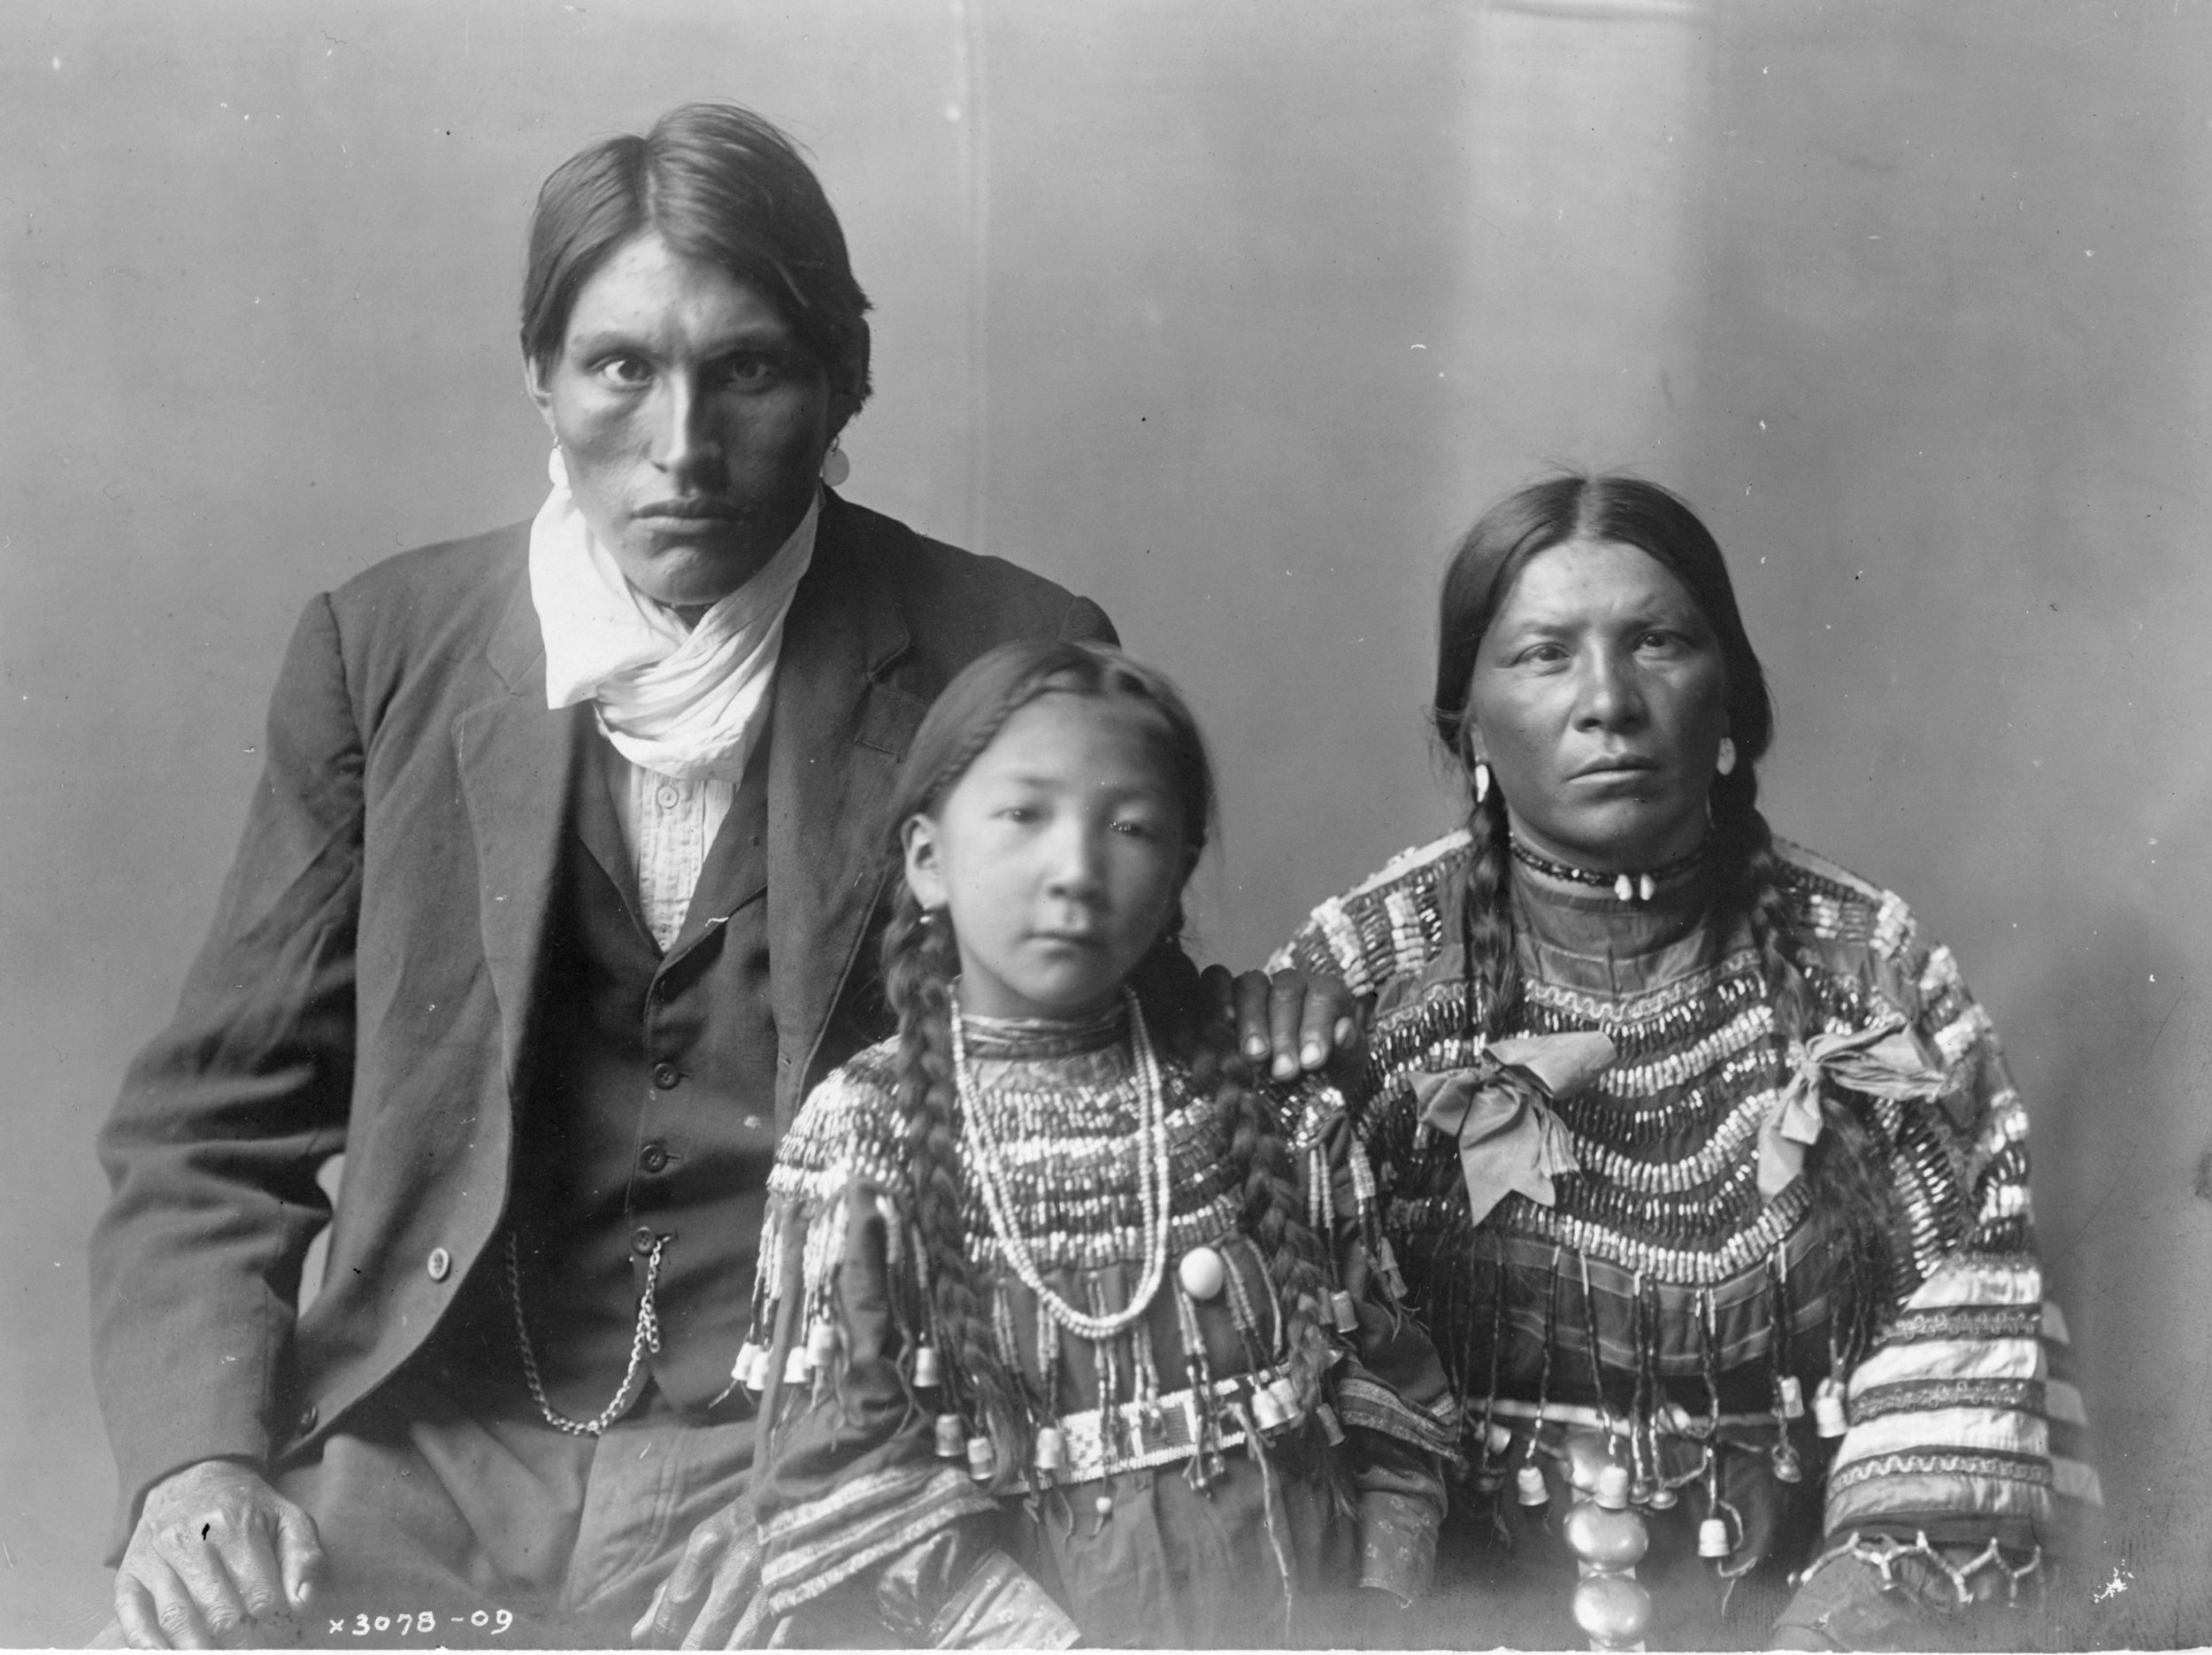 Reuben Black Boy and family